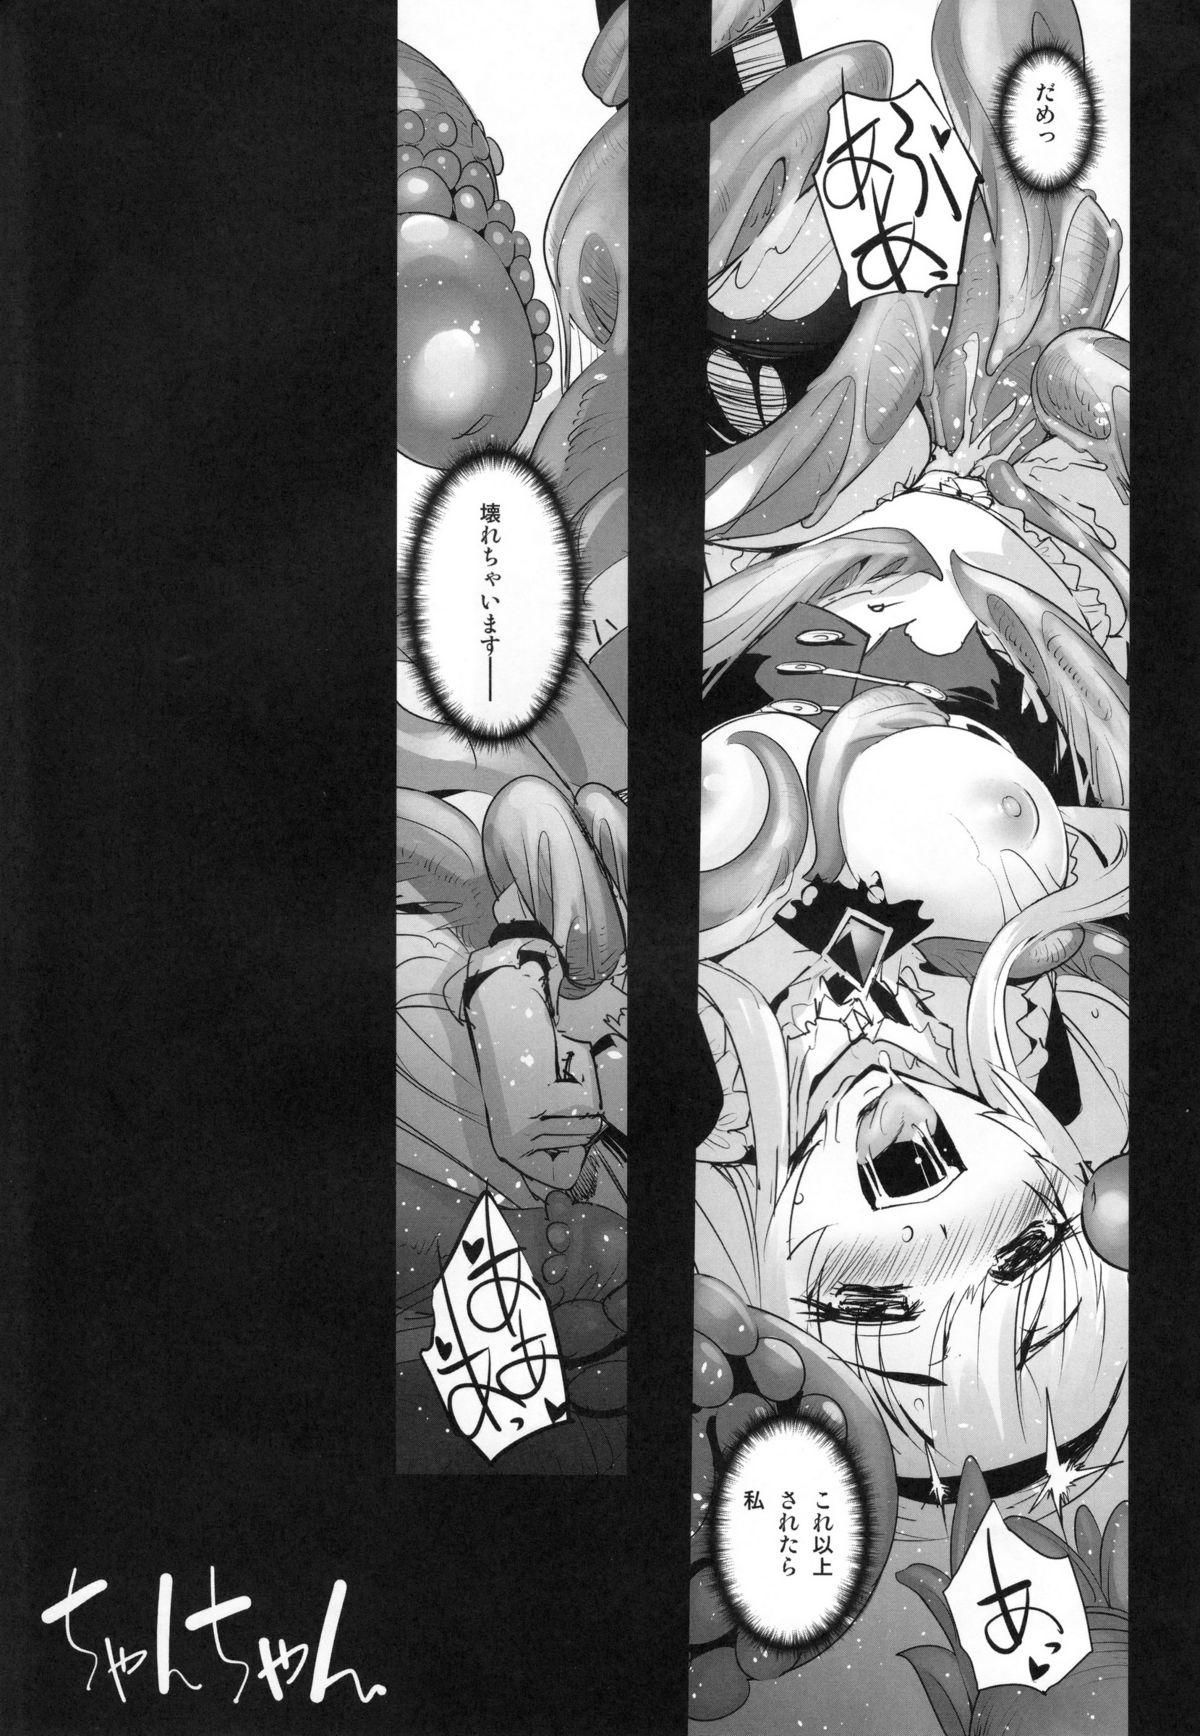 Anna to Majo no Shokushu Yuugi - Tentacle of Anna and Witch 31